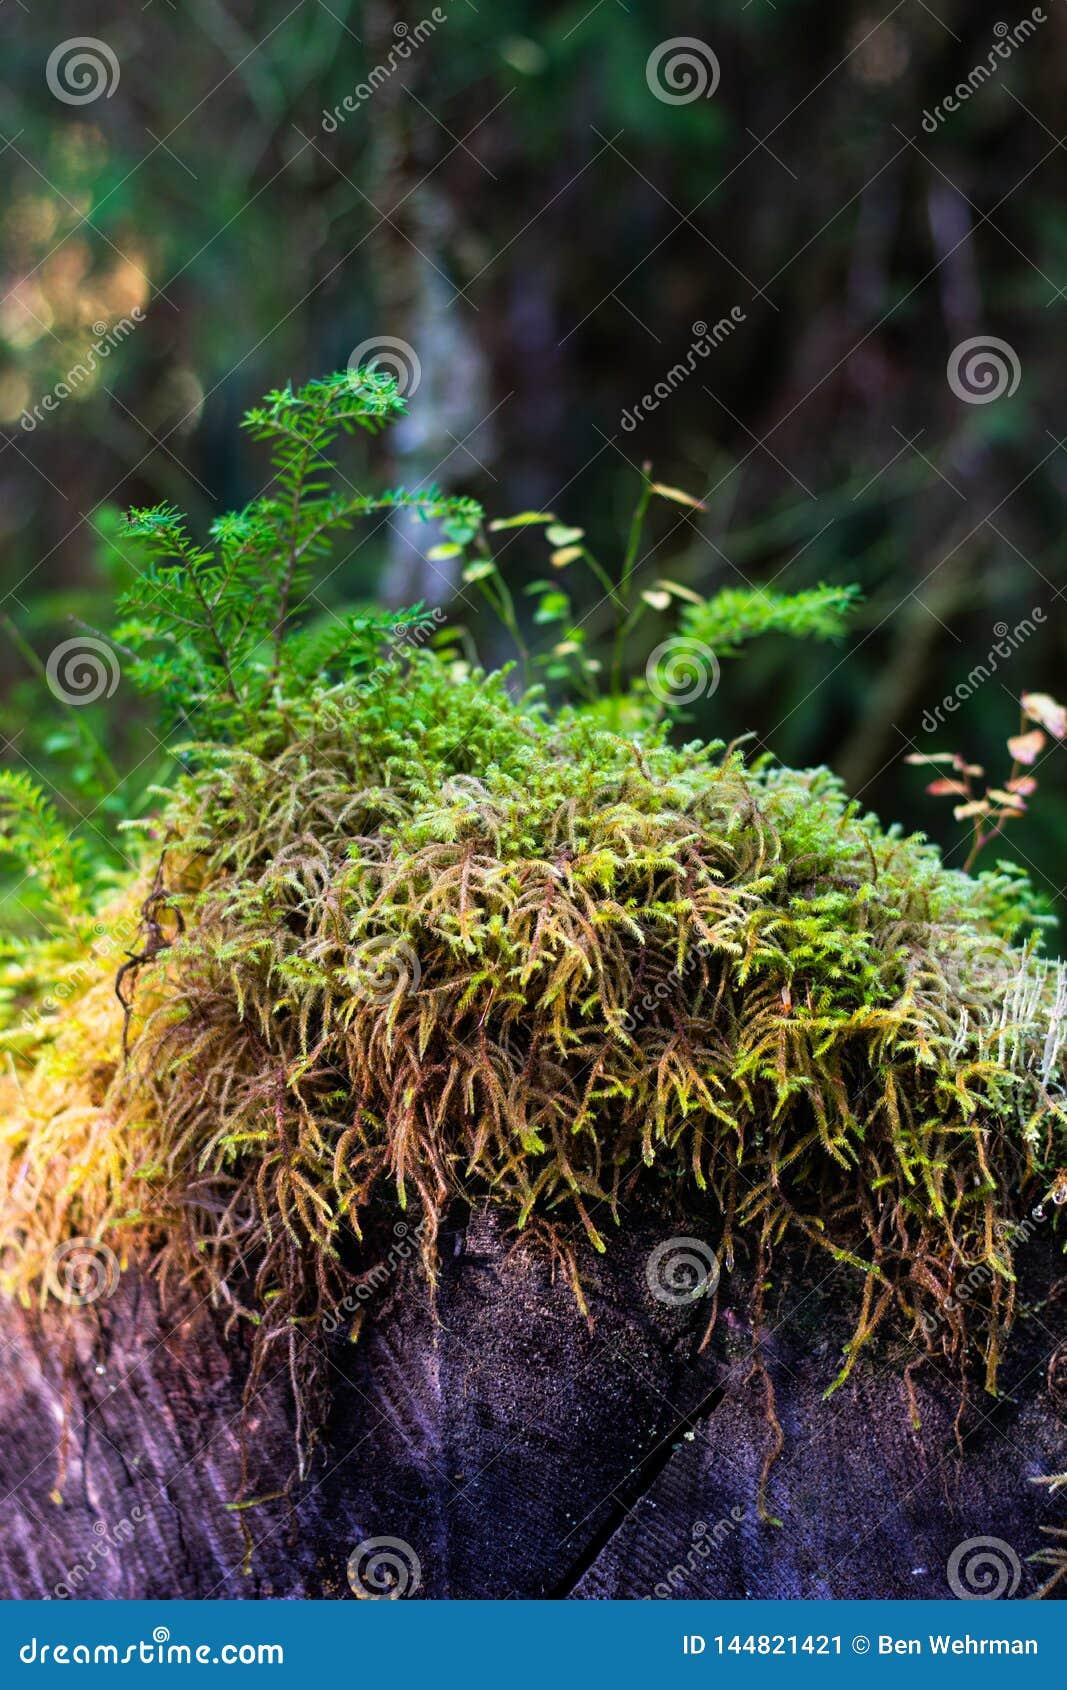 Moss Growing on a Log